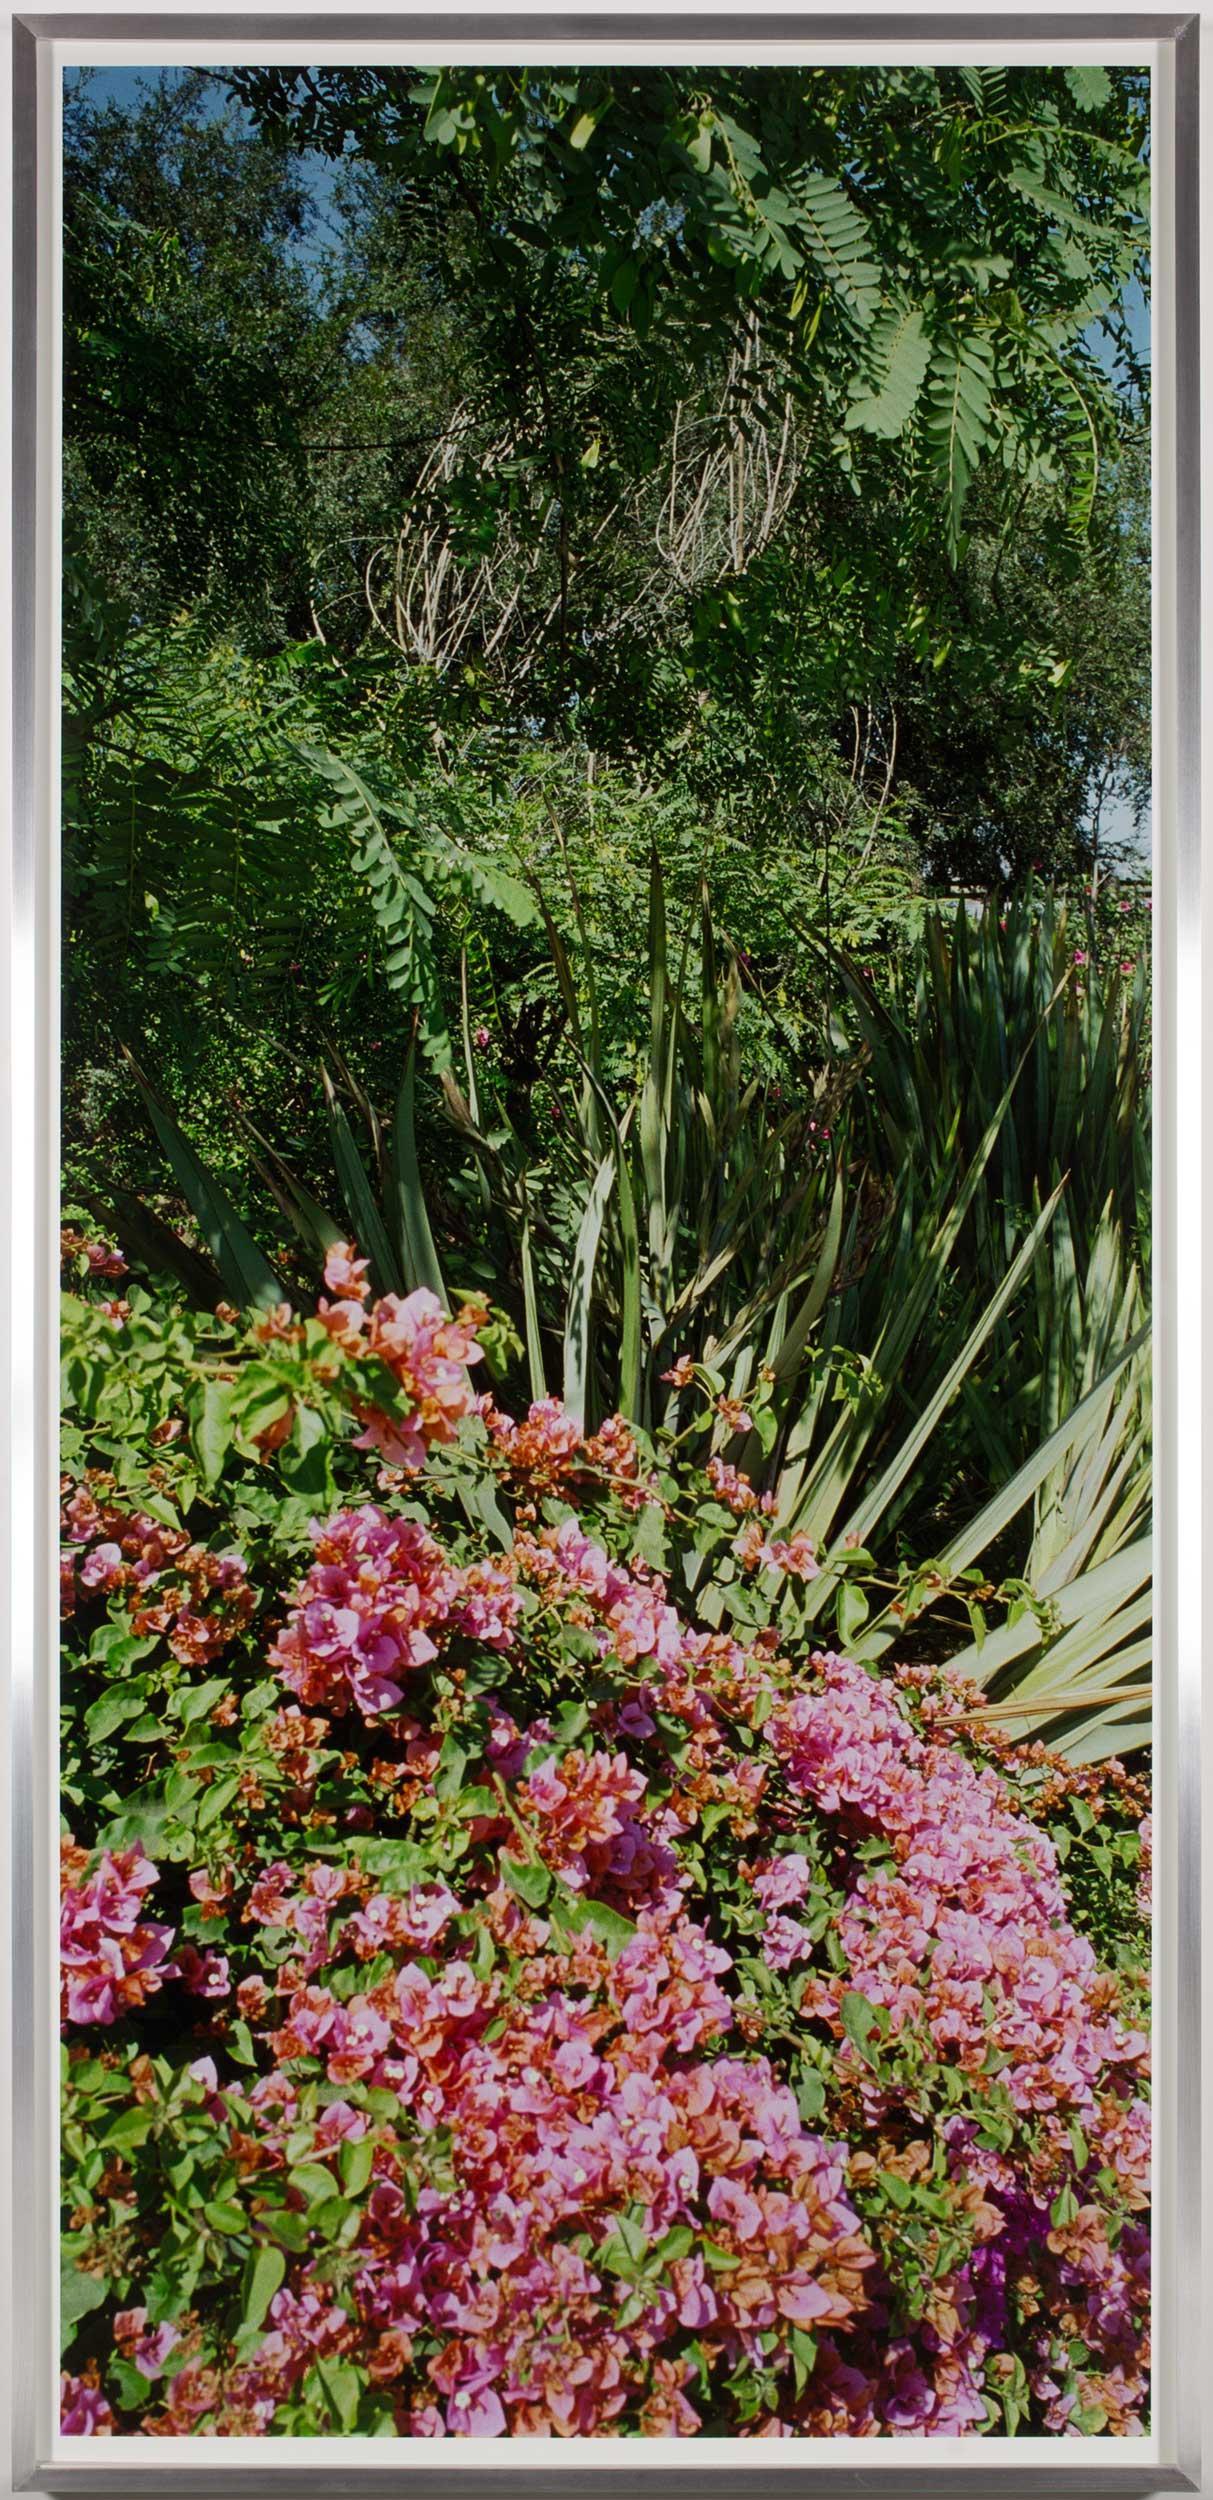 Island Flora #5 (Rte. 405 and Rte. 10 Interchange)    2005   Chromogenic print  99 1/2 x 47 1/2 inches